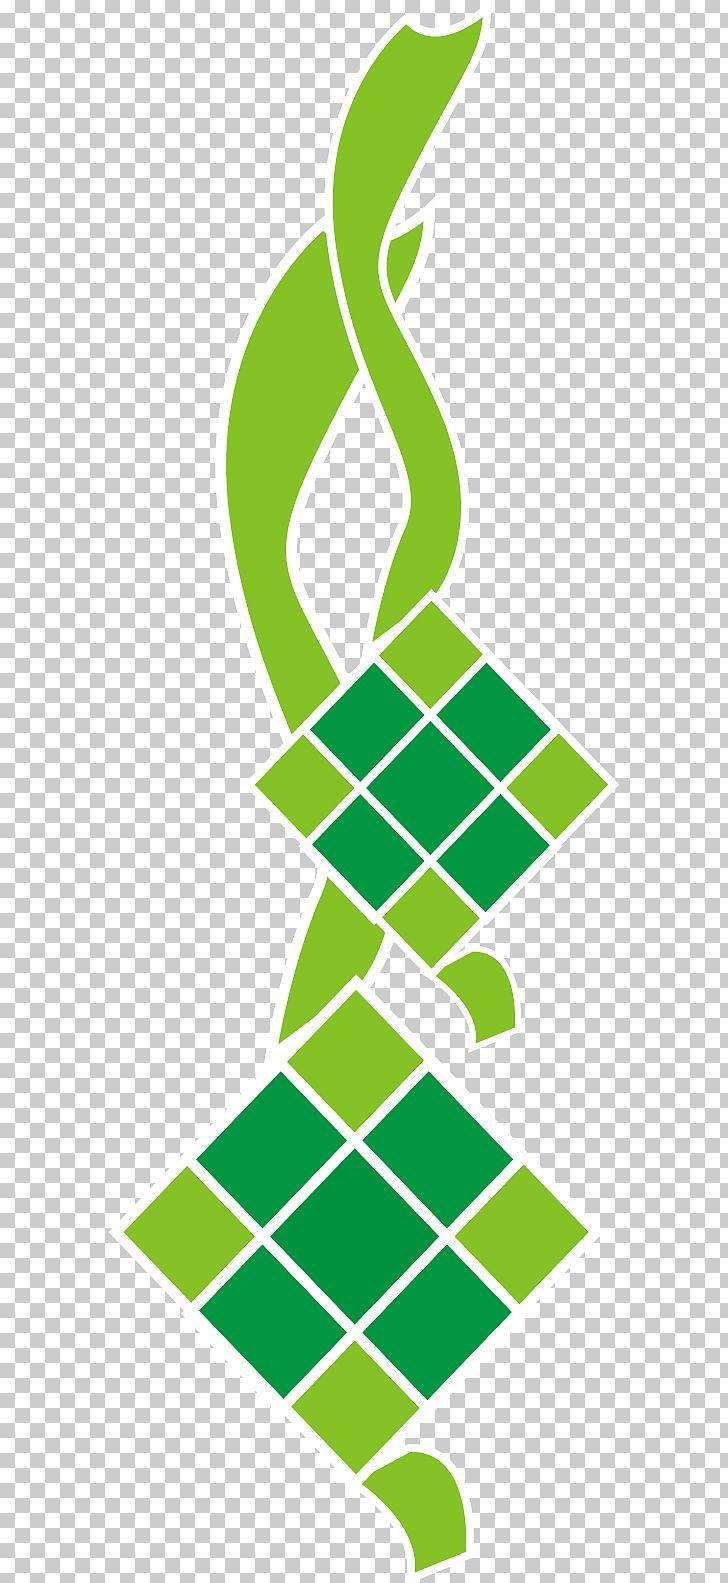 Ketupat Eid Al-Fitr PNG, Clipart, Aidilfitri, Angle, Area, Artwork, Eid Al Fitr Free PNG Download